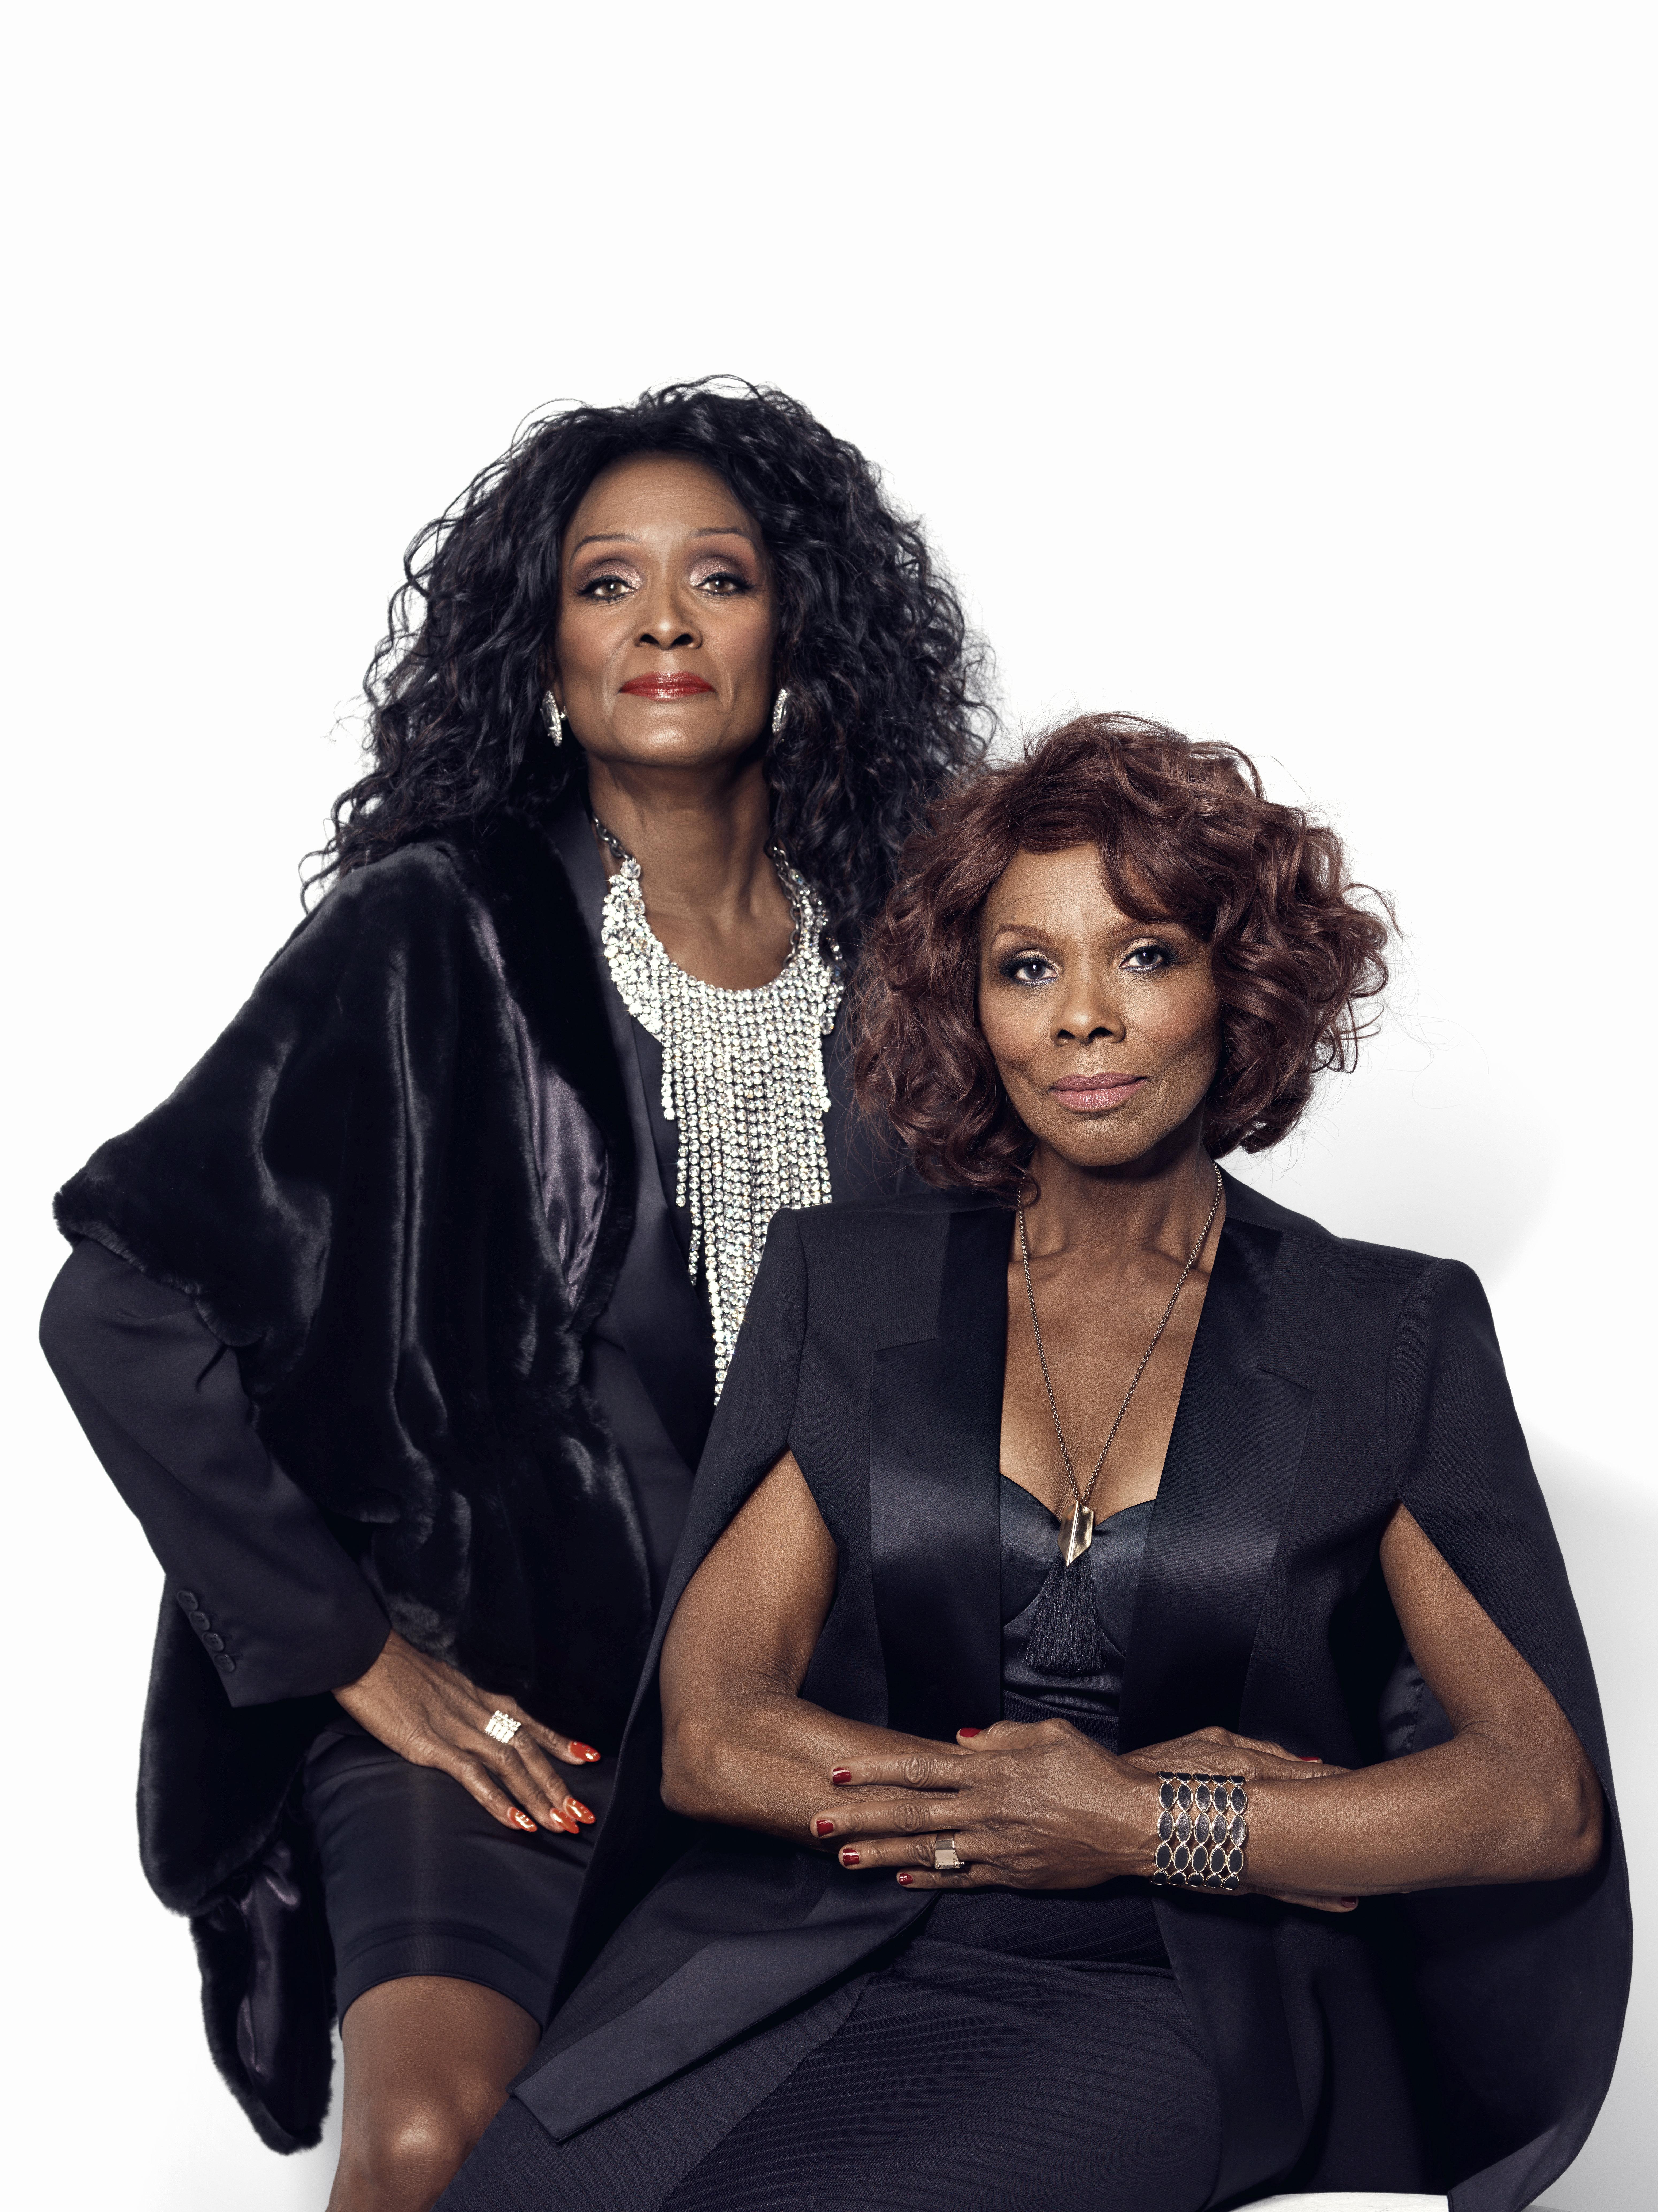 6200x8272 Celebrity Photographer Kwaku Alston Shoots Portraits Of Black